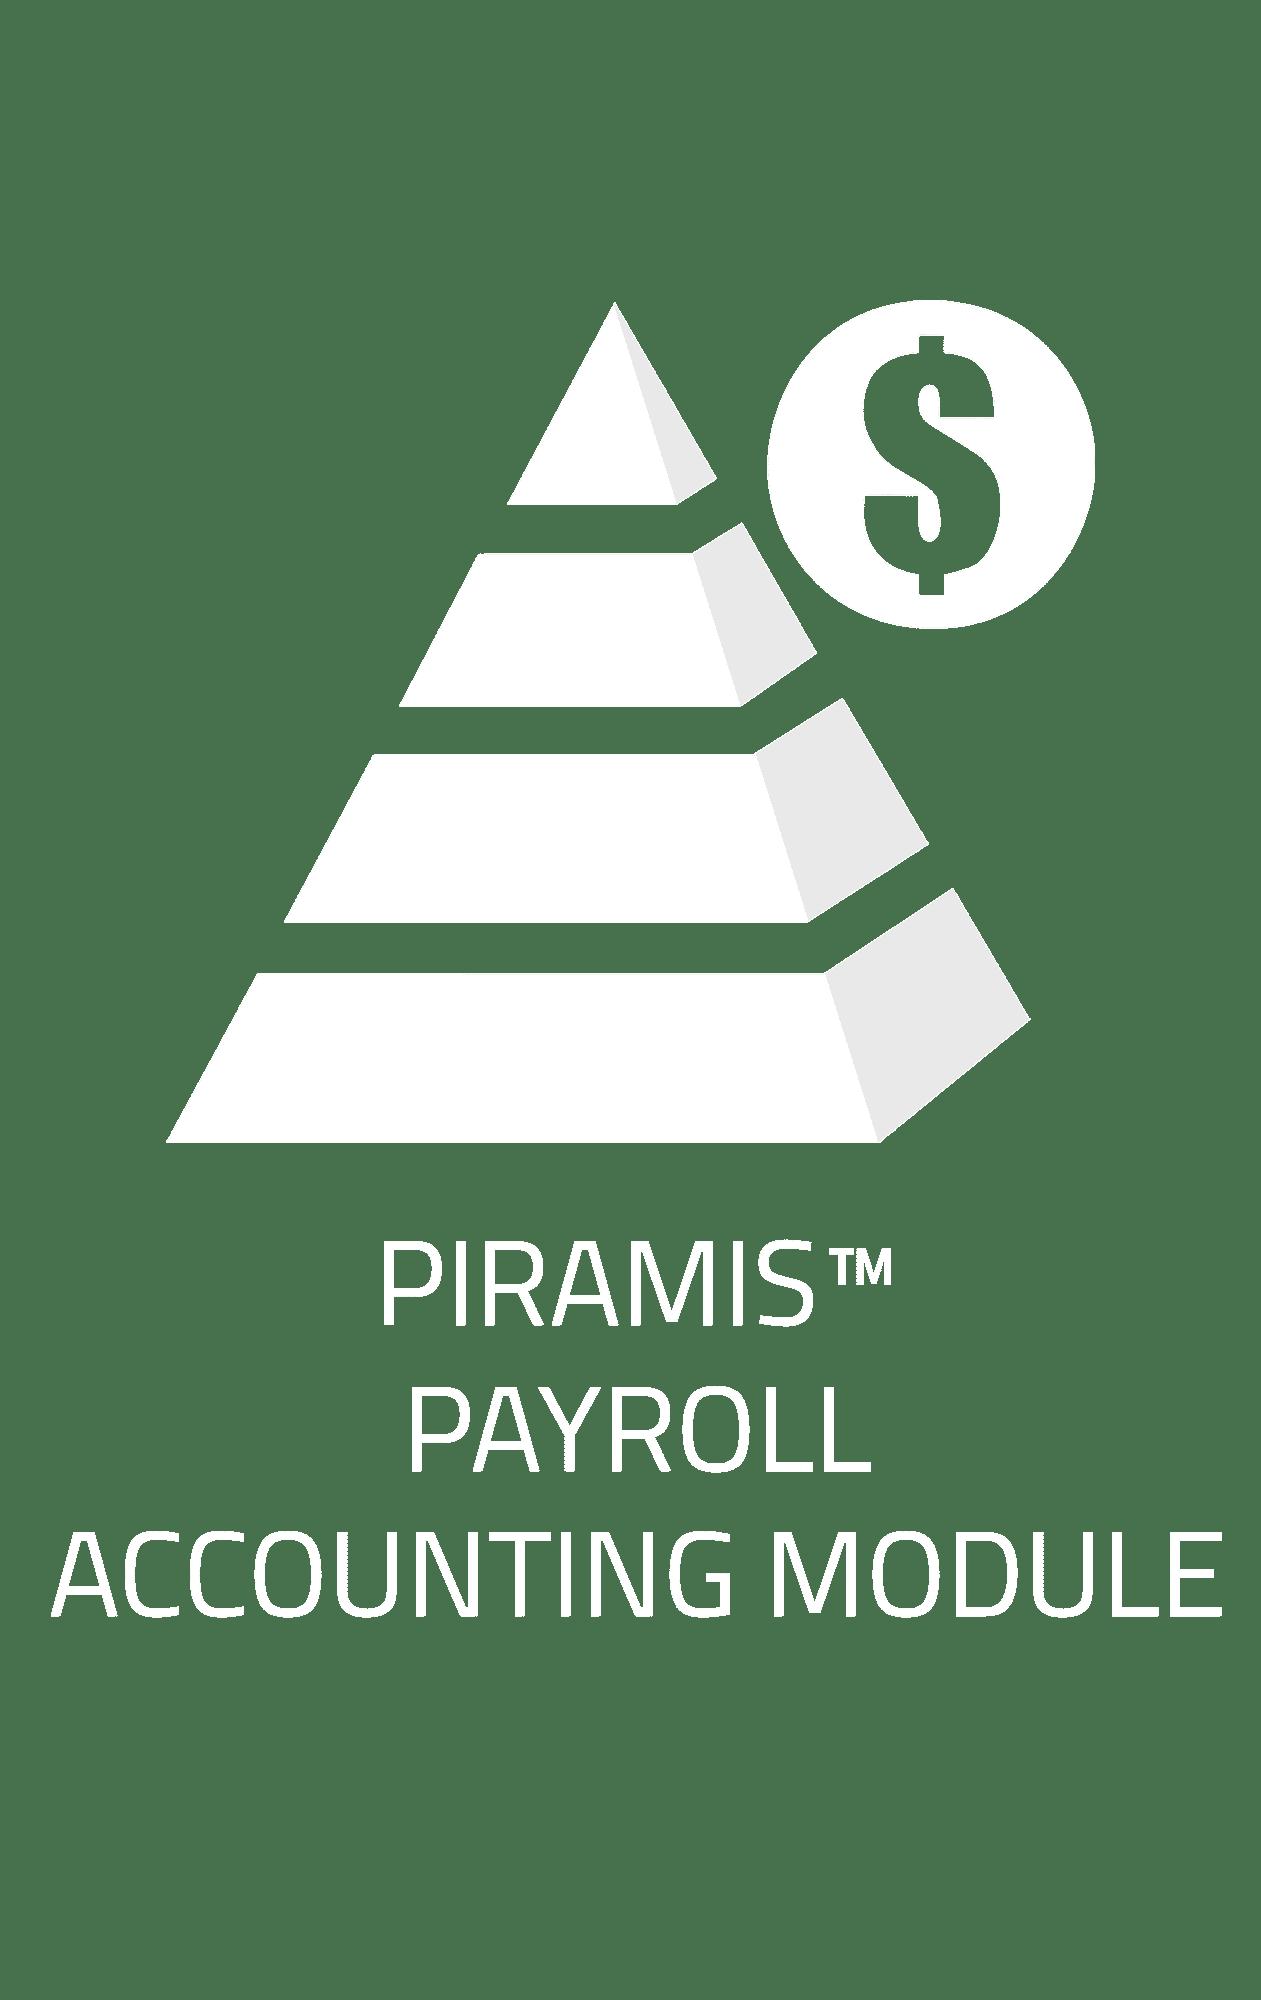 PIRAMIS™ Payroll Account Module